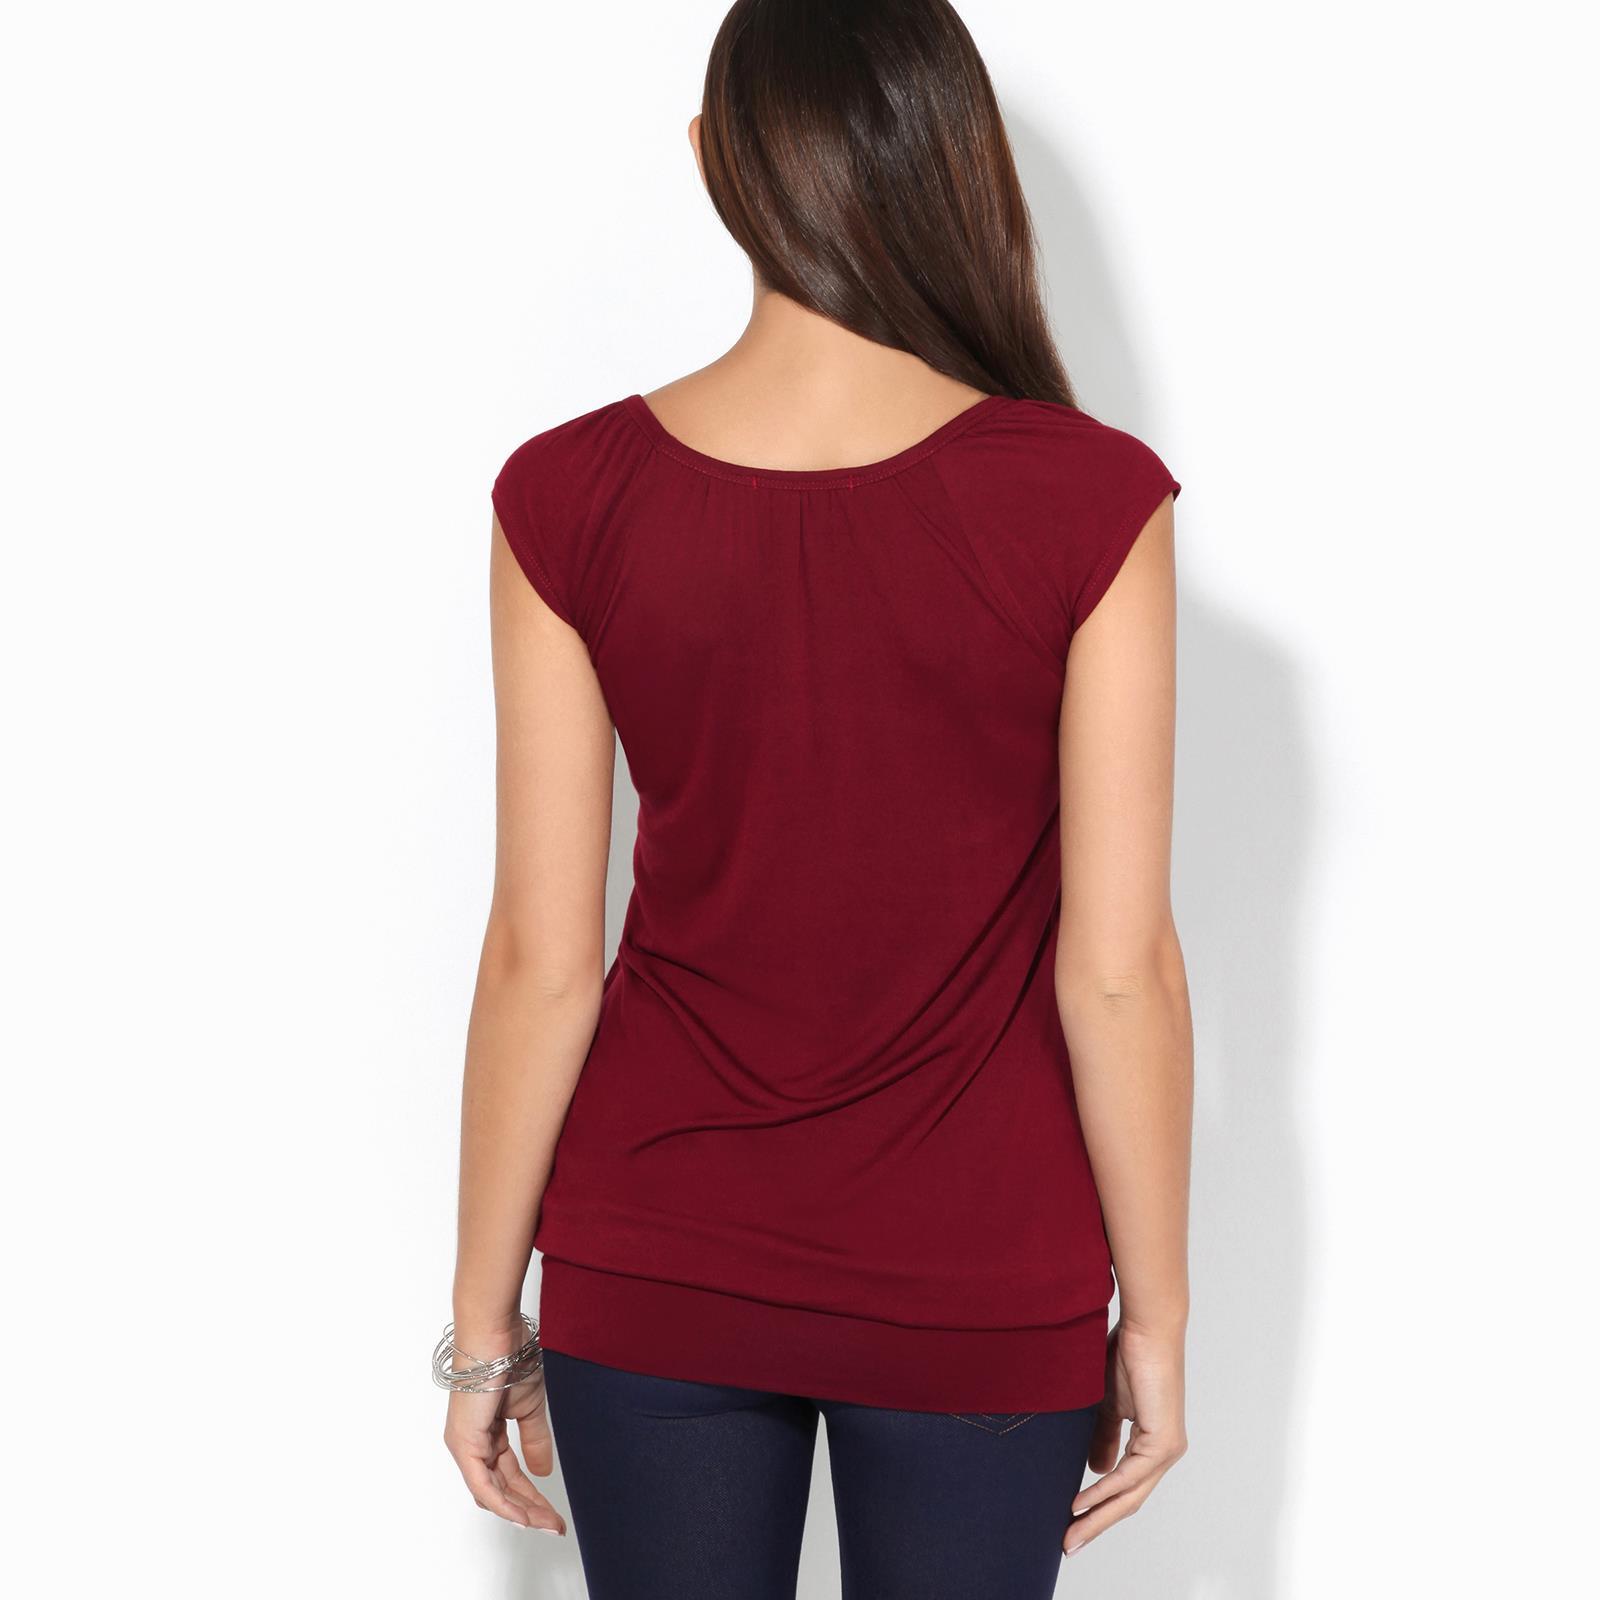 Womens-Ladies-Scoop-Neck-Blouse-V-T-Shirt-Long-Short-Sleeve-Plain-Loose-Top thumbnail 57